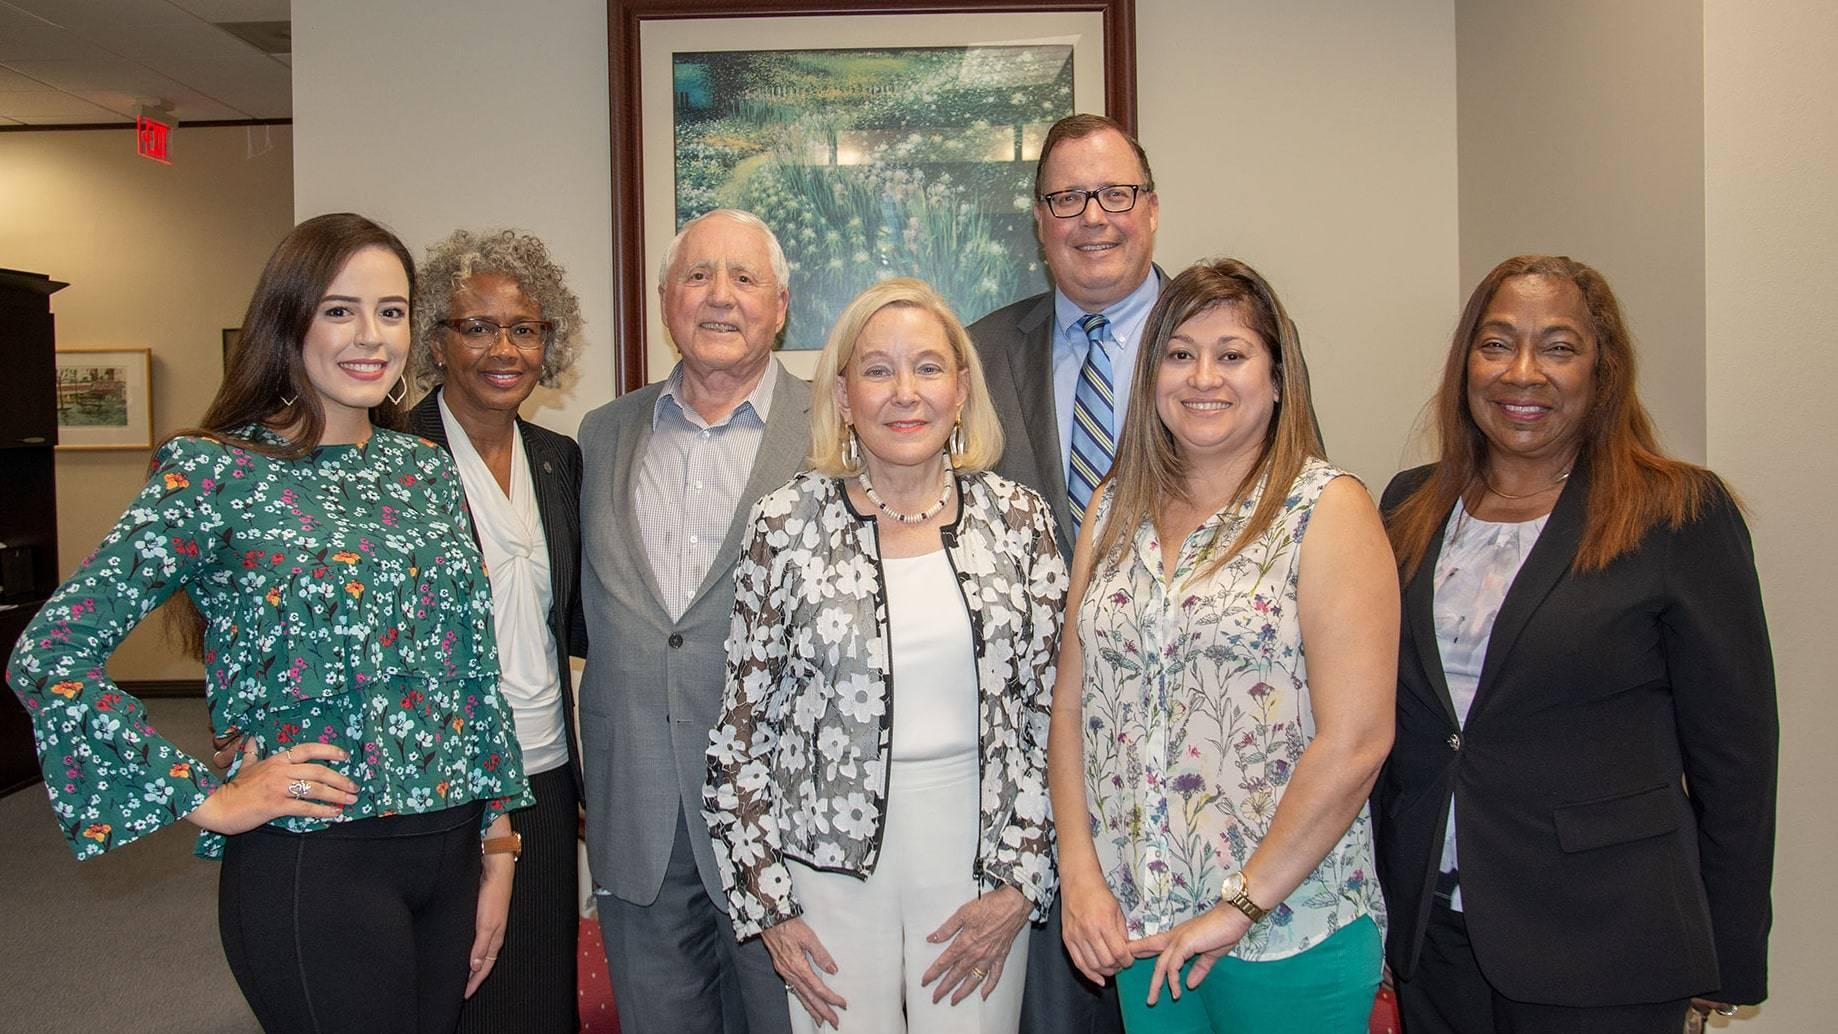 Wilson scholarship recognizes two exceptional future educators